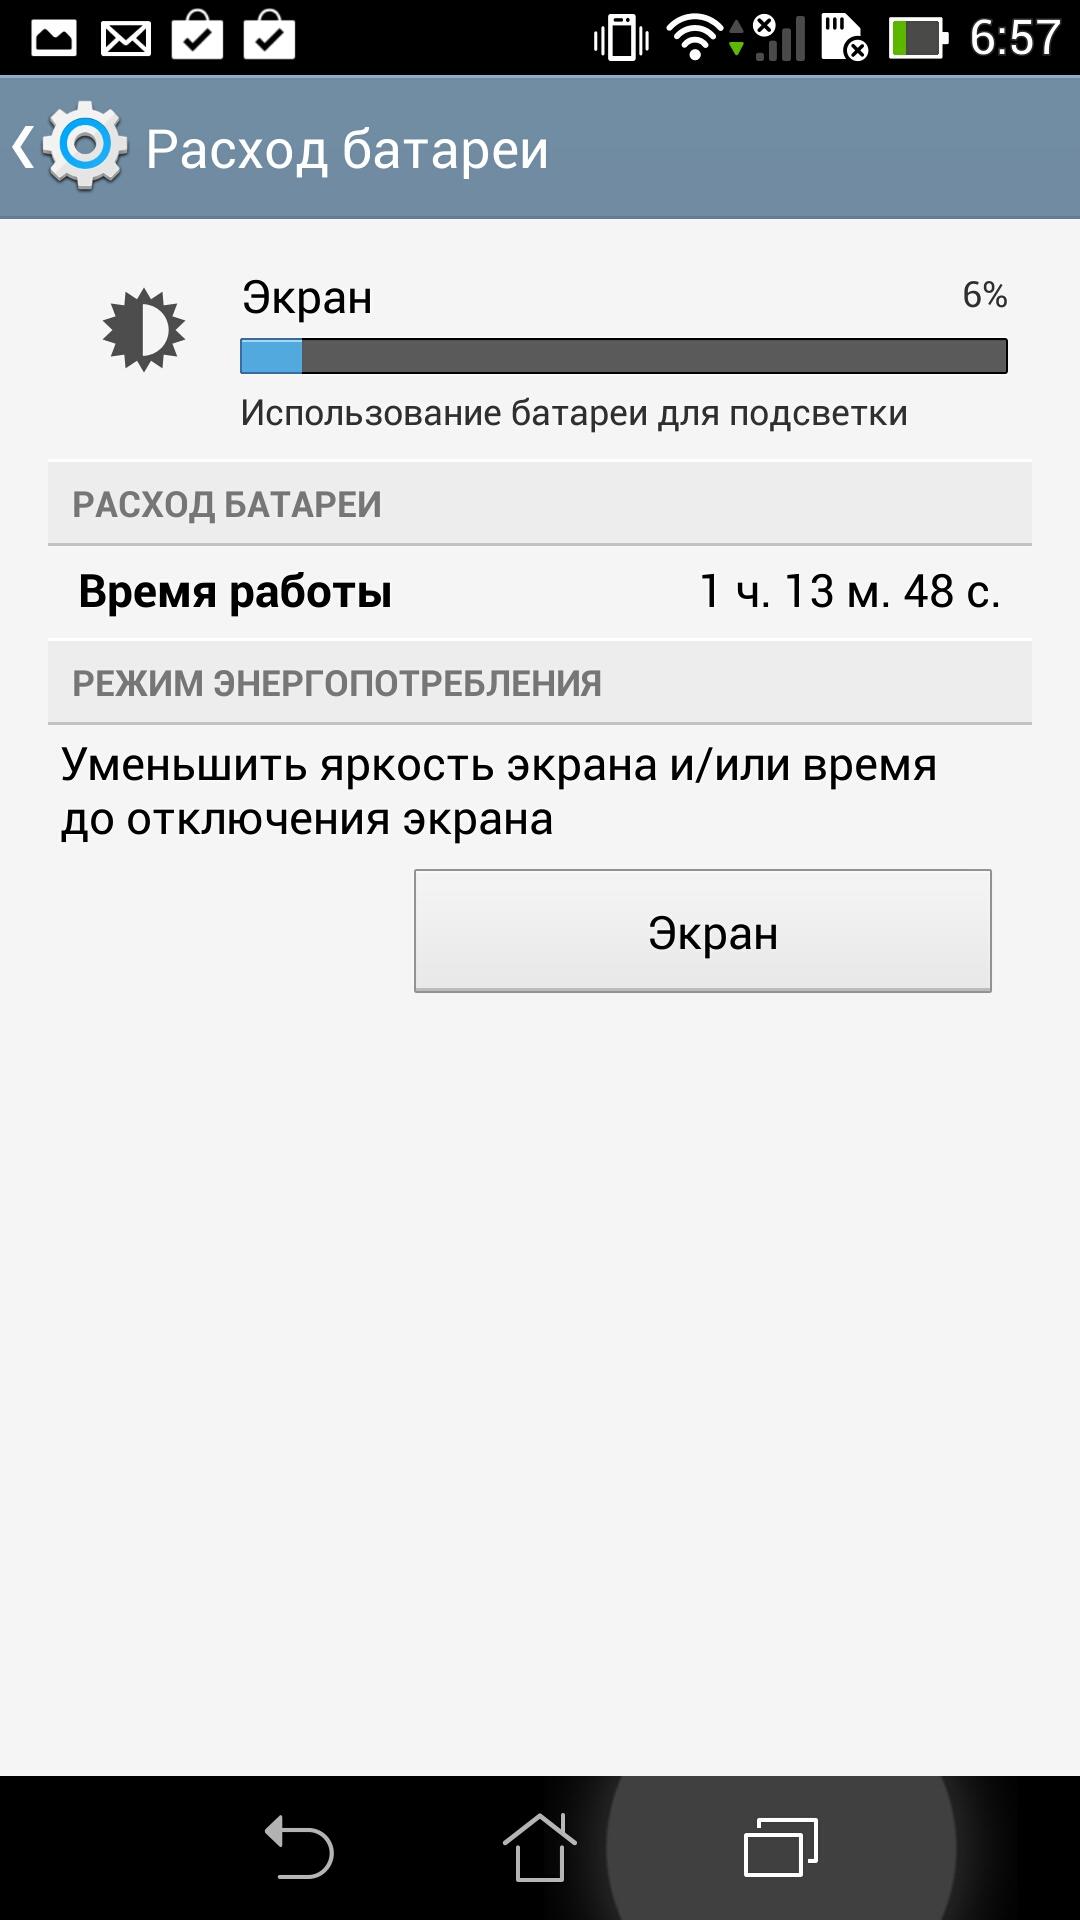 Screenshot_2014-02-11-06-57-11